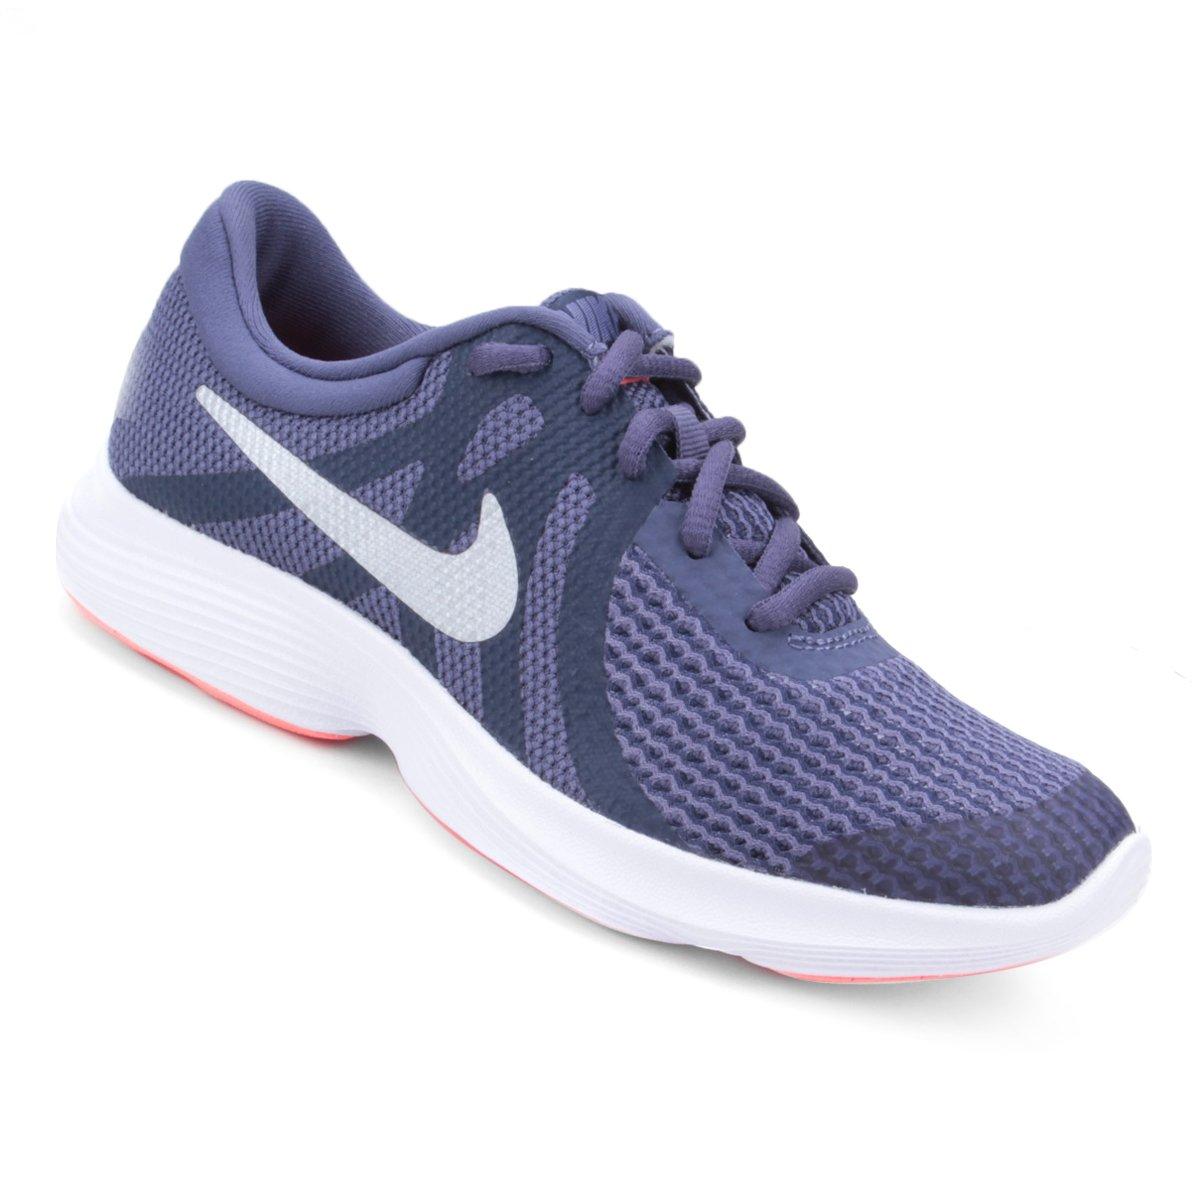 eee84a3c8c6 Tênis Infantil Masculino Nike Revolution 4 Masculino Infantil Compre Agora  b7e195